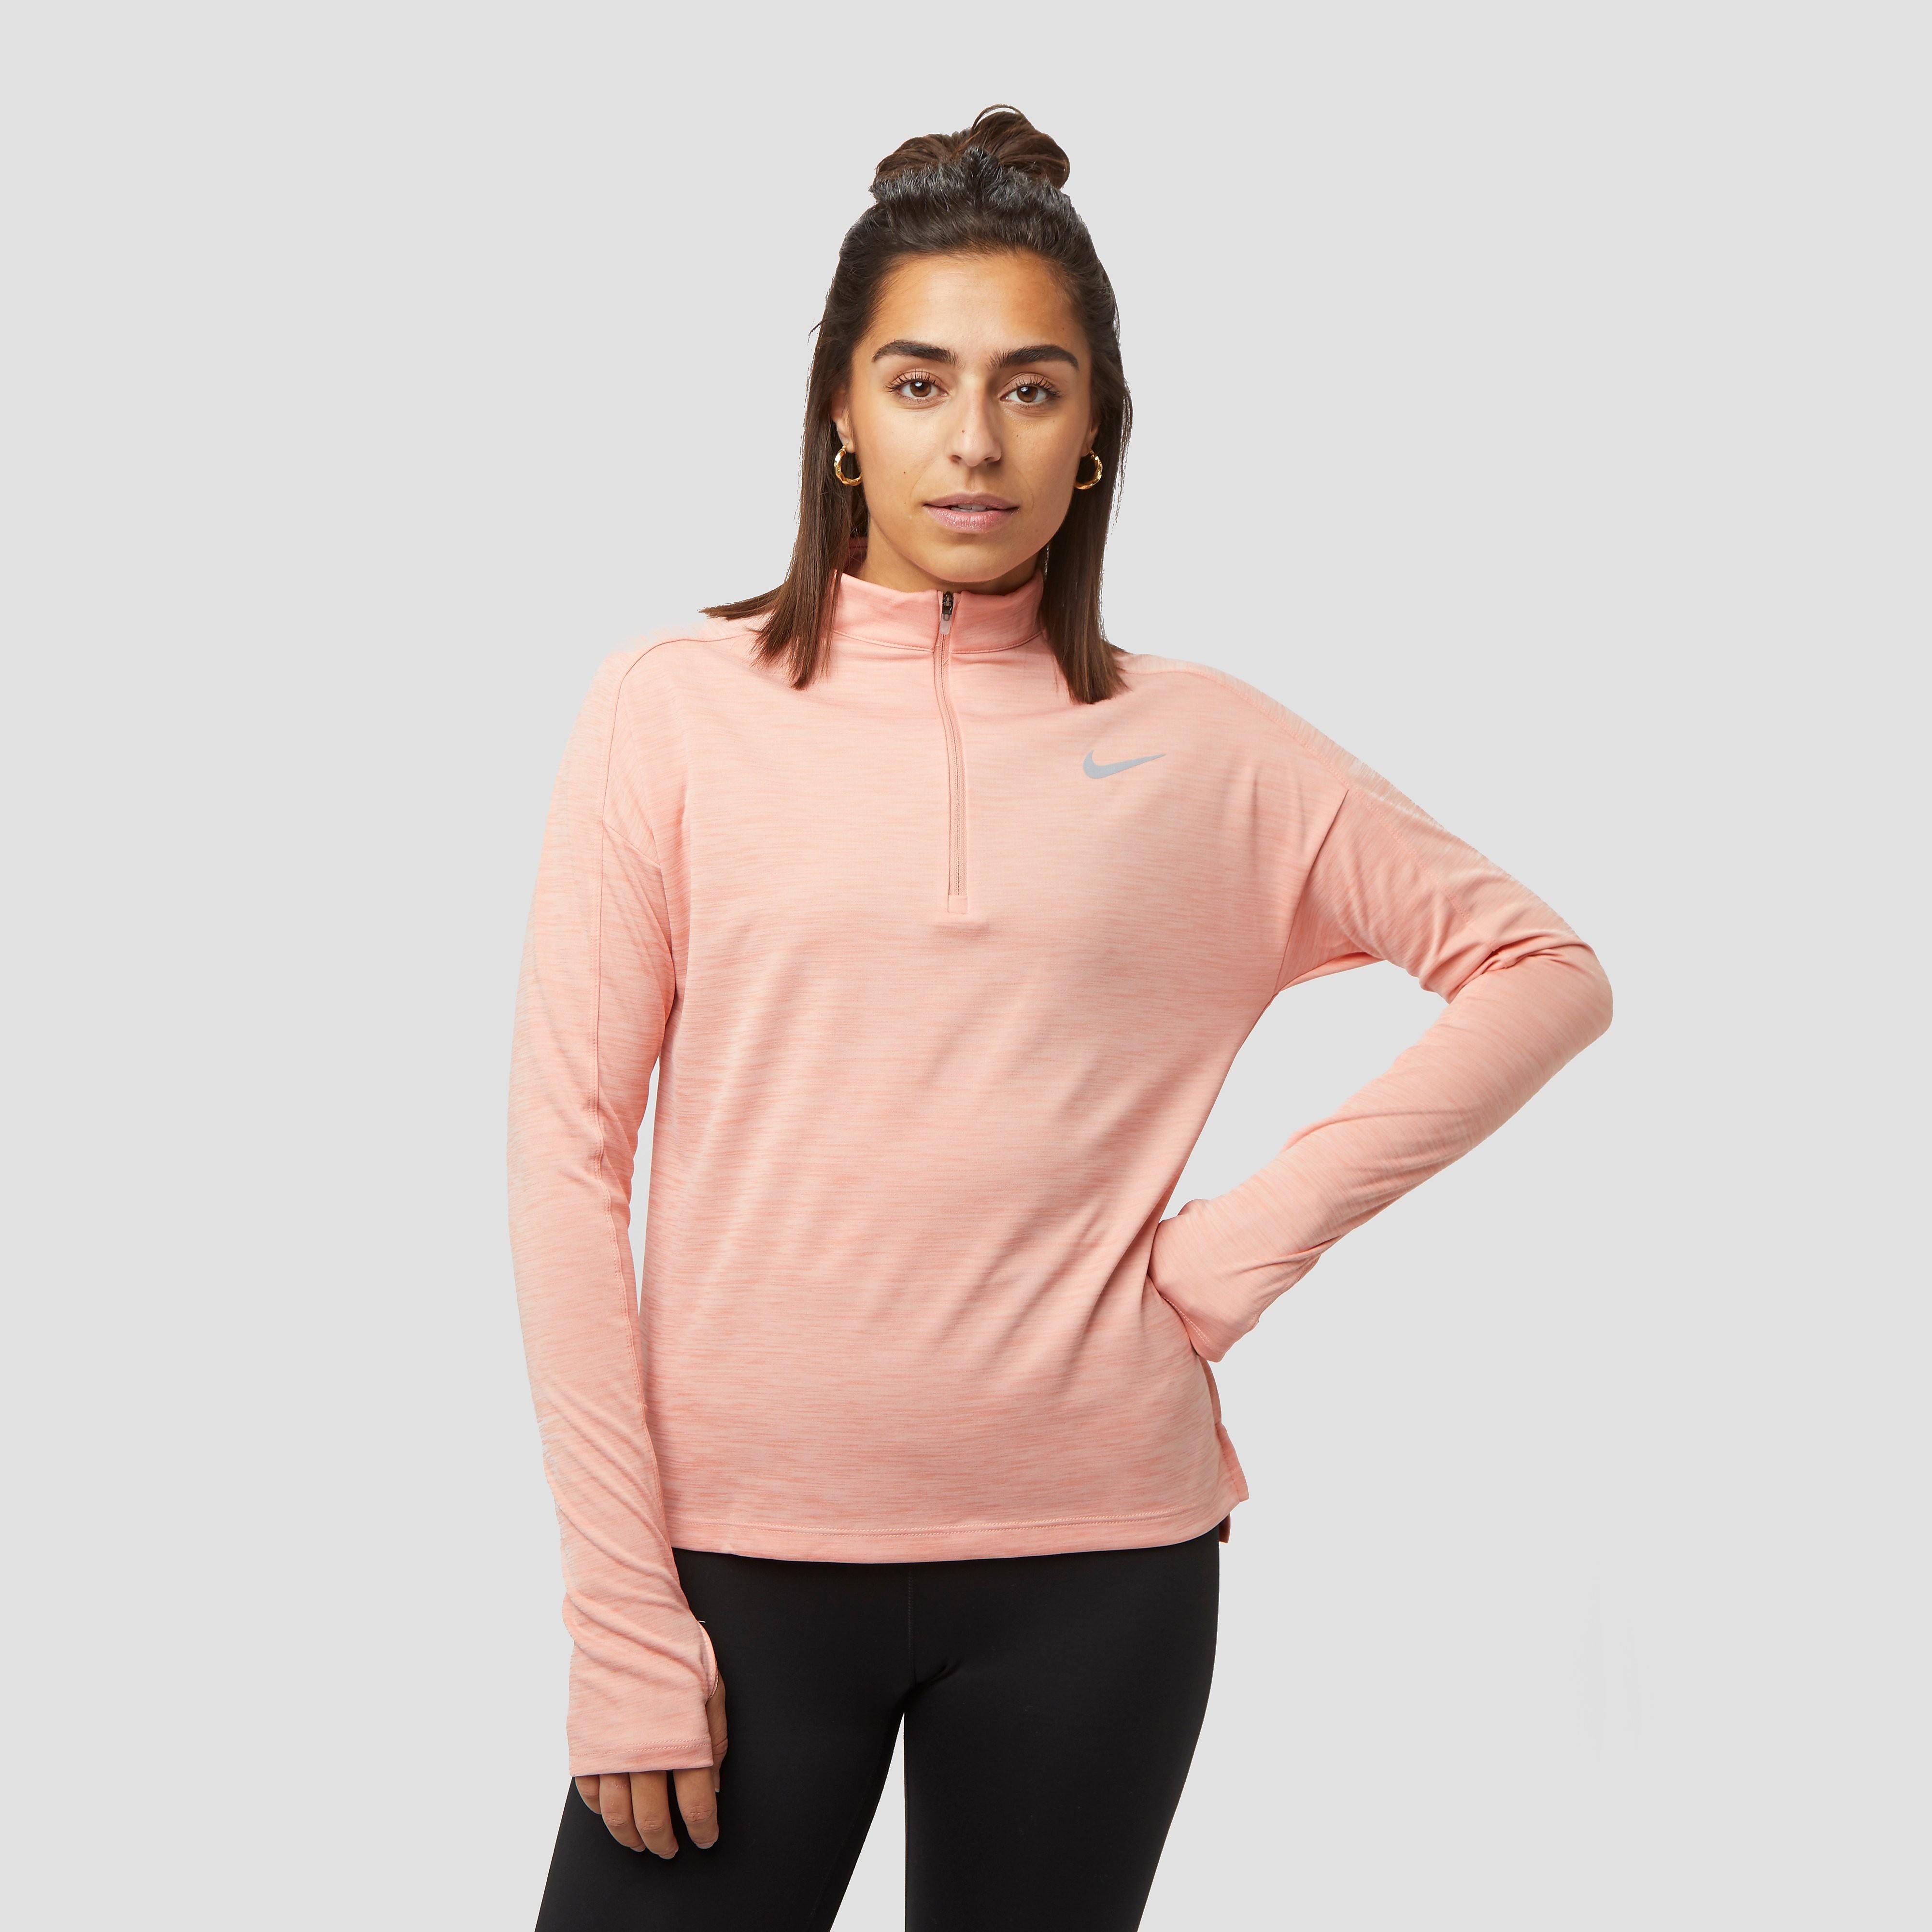 NIKE Pacer hardlooptop roze dames Dames